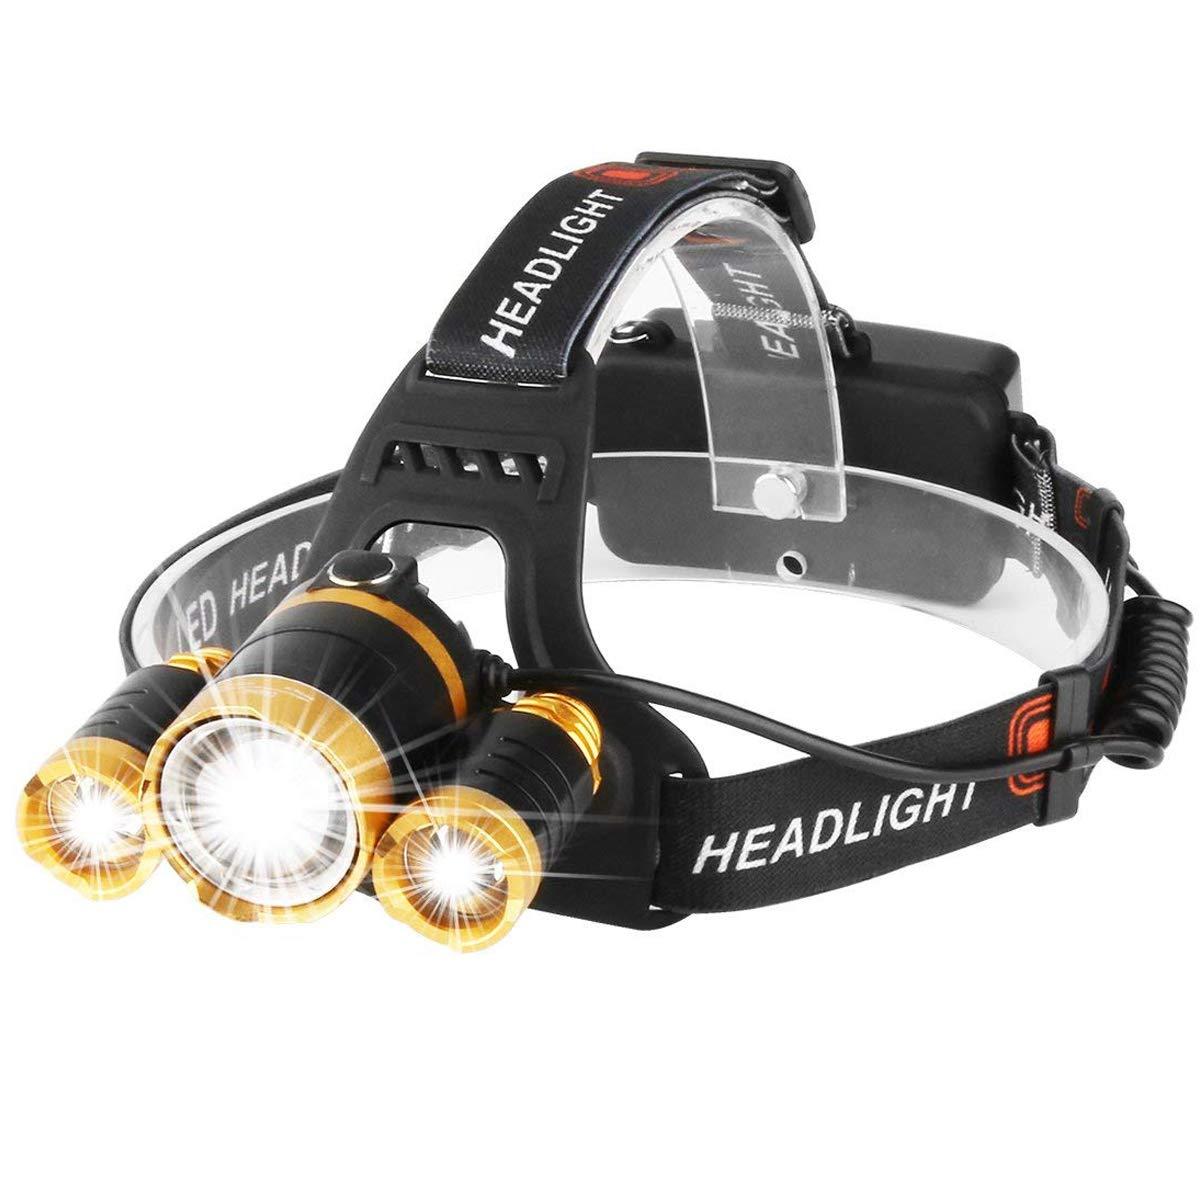 UK Super Bright Waterproof Head Torch//Headlight USB Rechargeable Headlamp Work